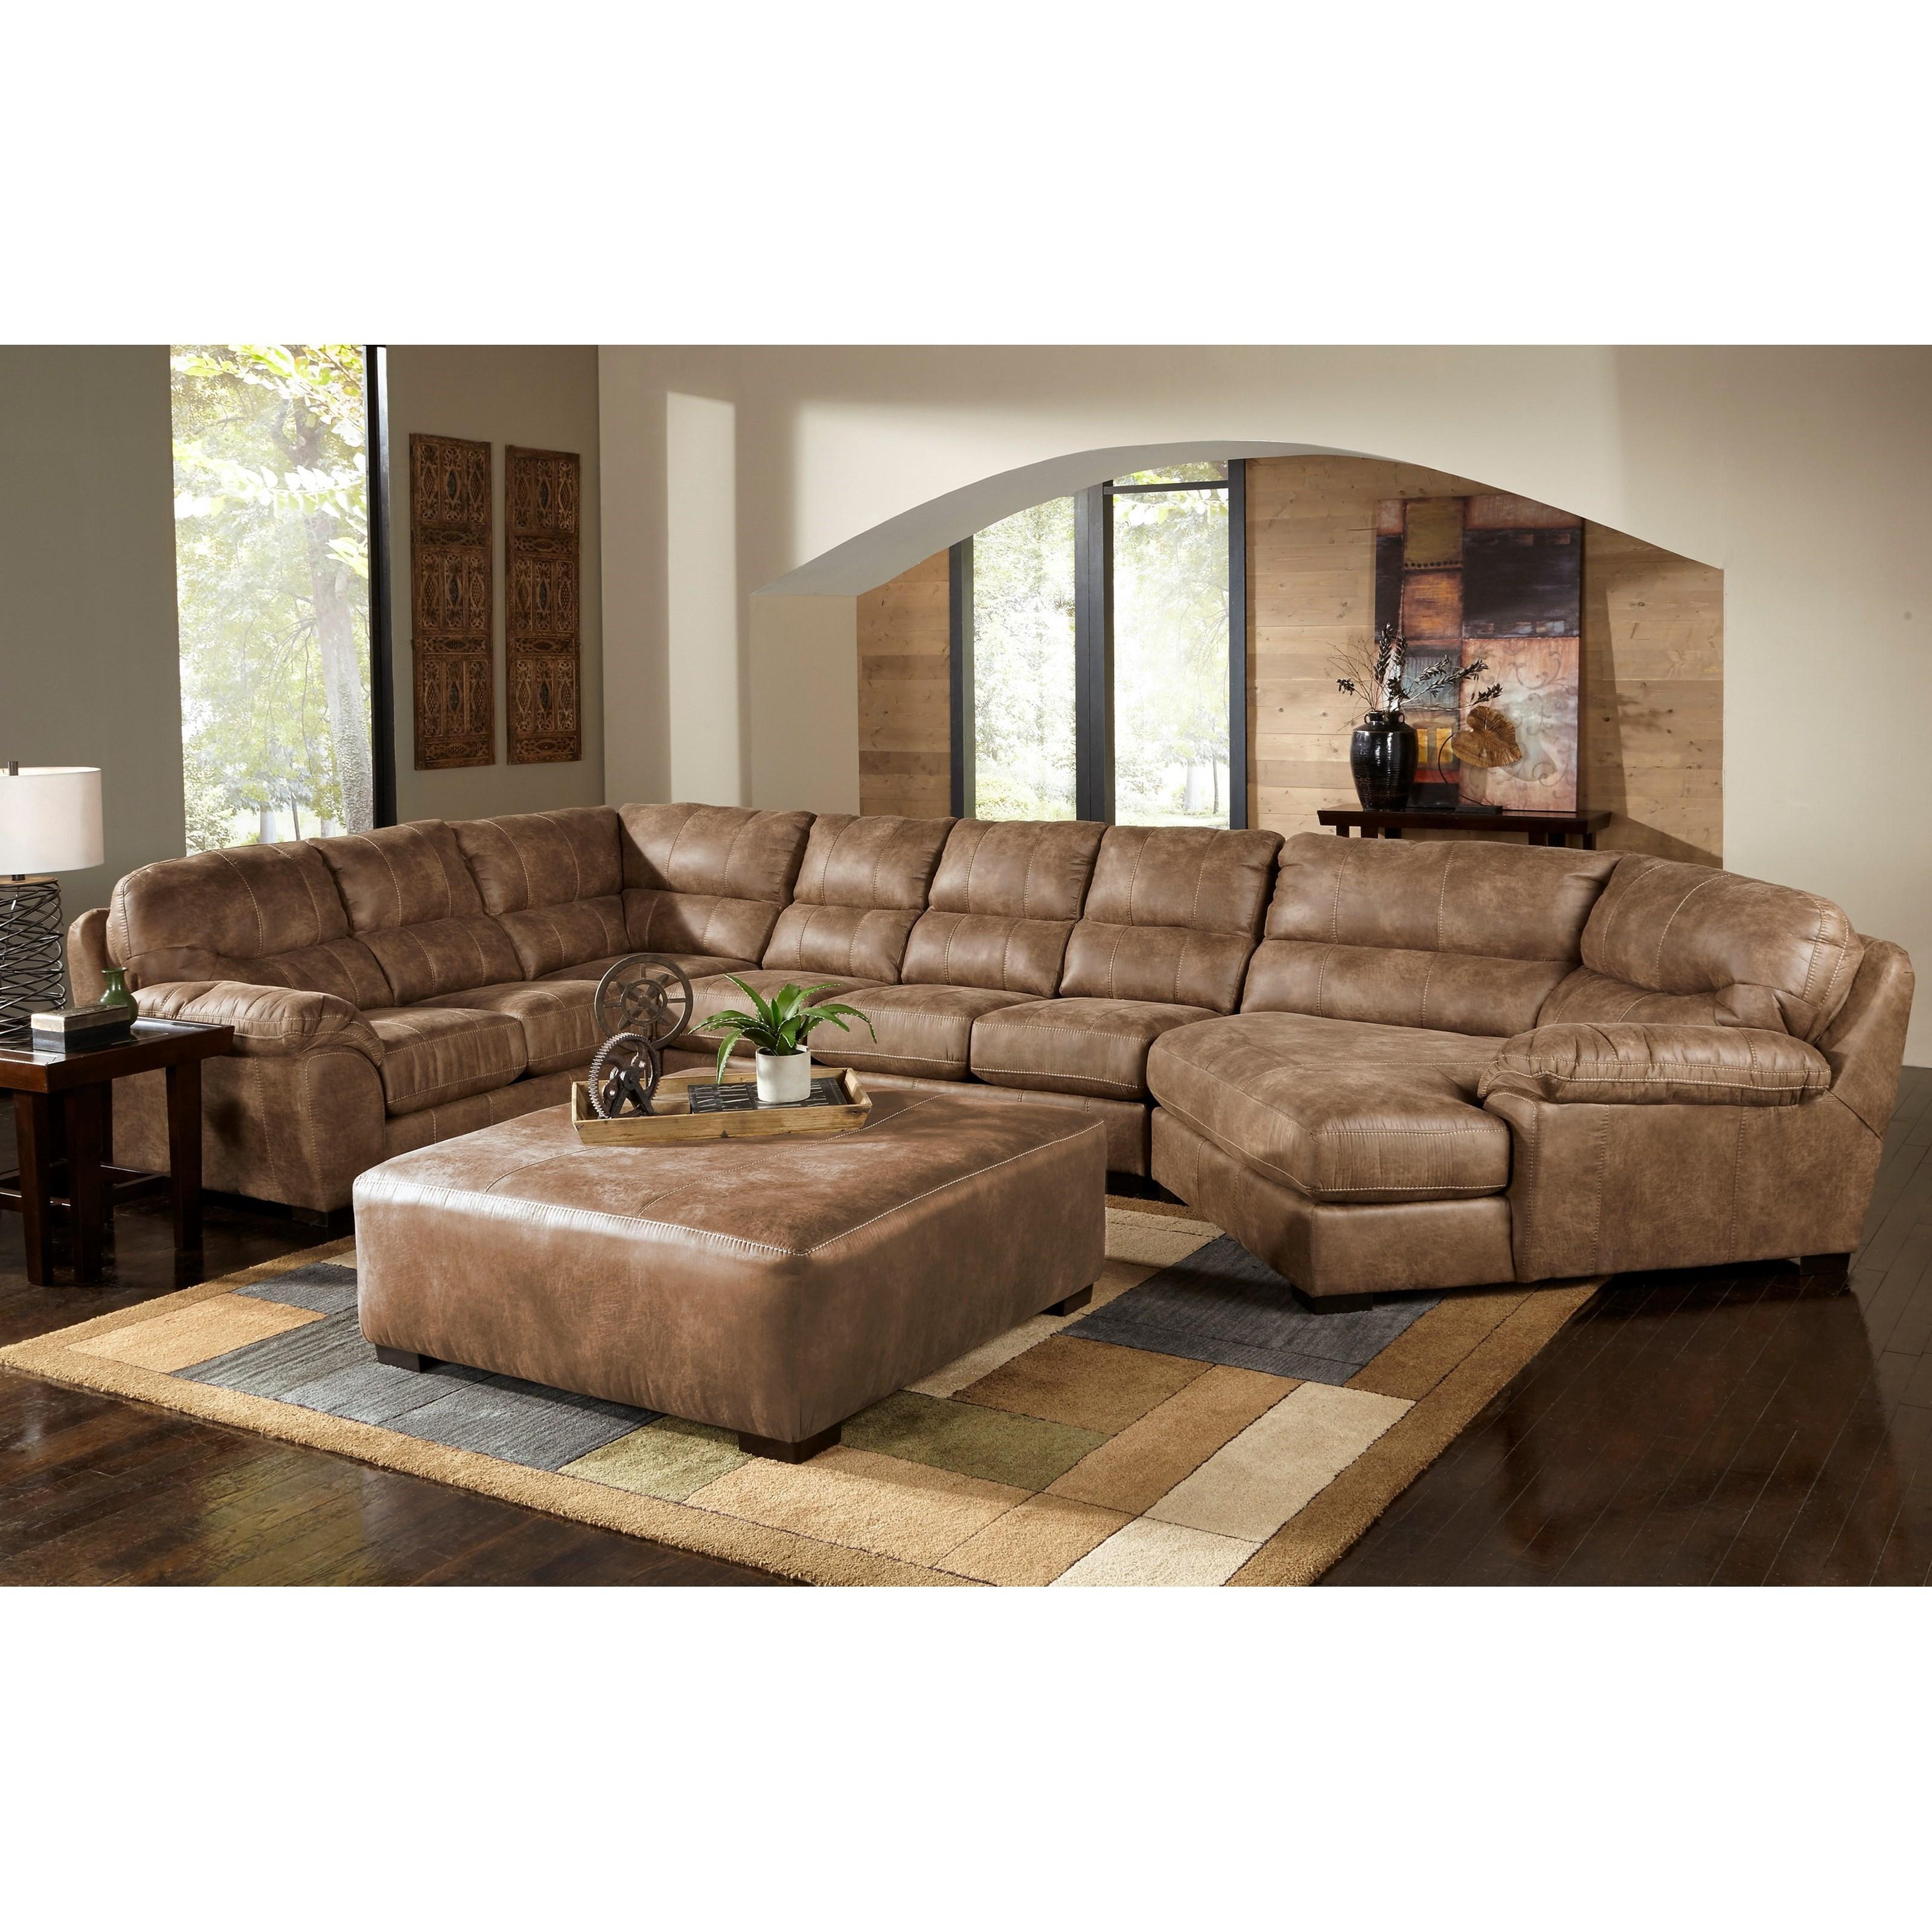 Jackson Furniture Grant Sectional Sofa - Item Number: 445362+30+96-Silt